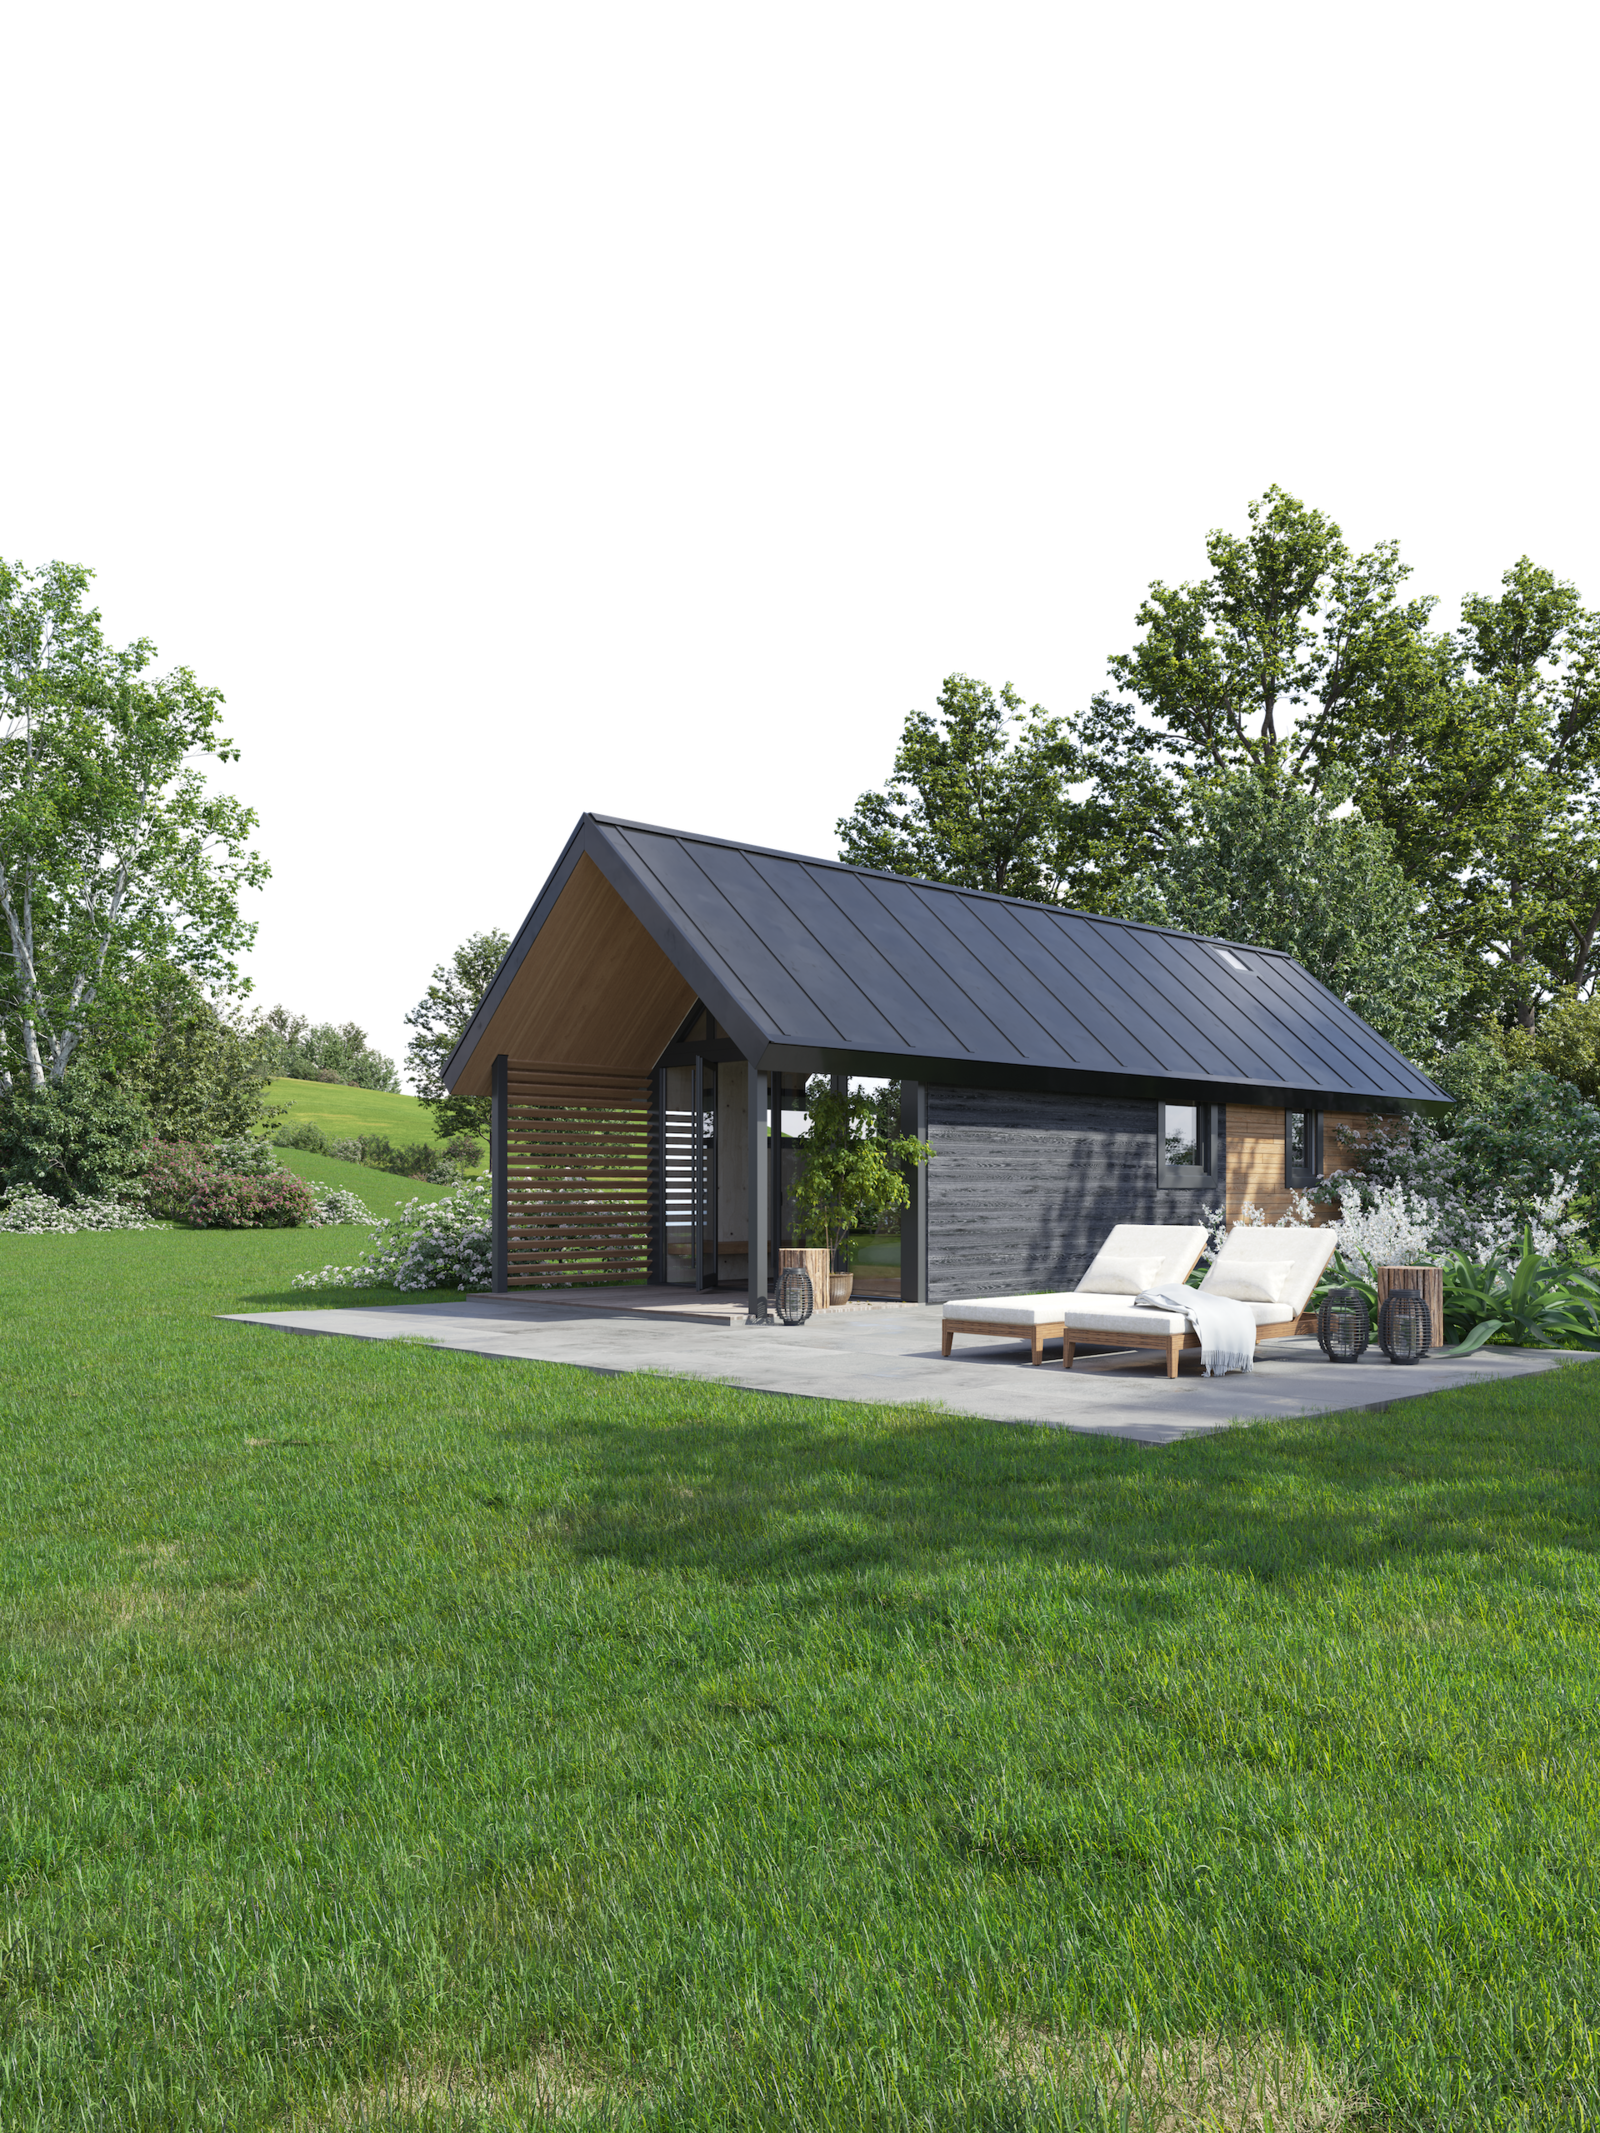 Tiny house - Berg Lodge - Phase 3